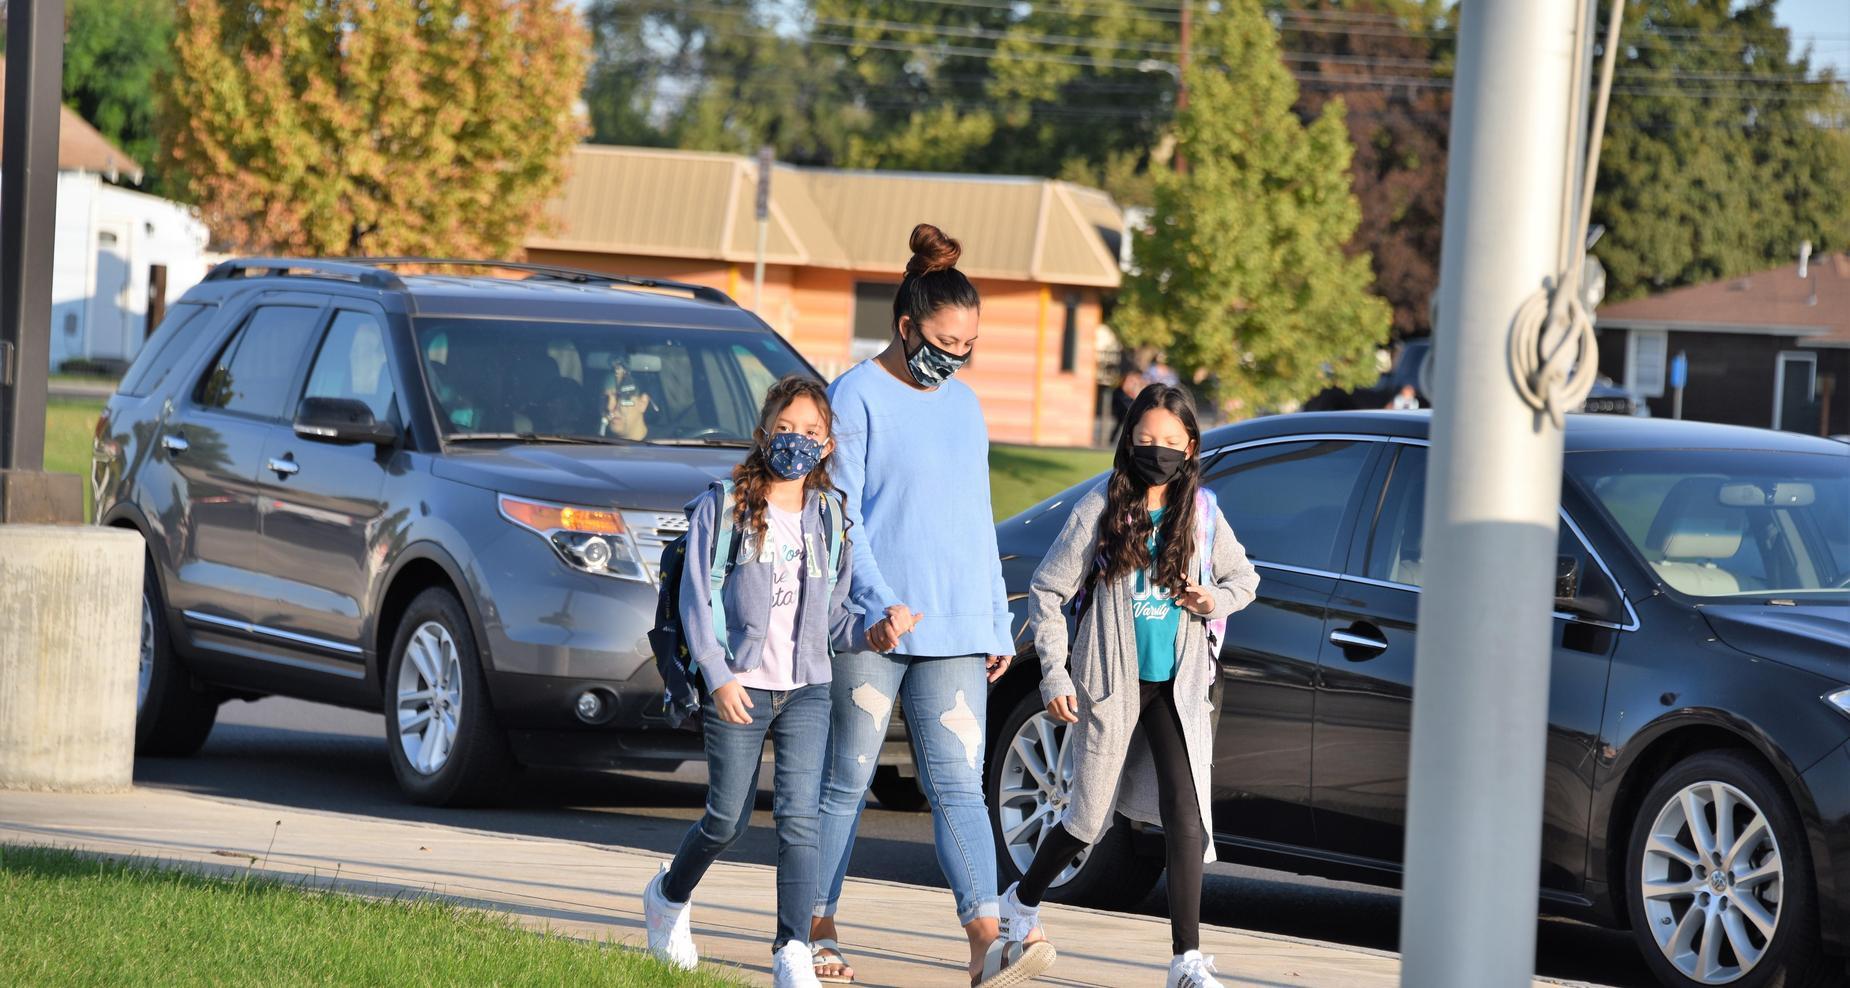 Mom walking her daughters to school.